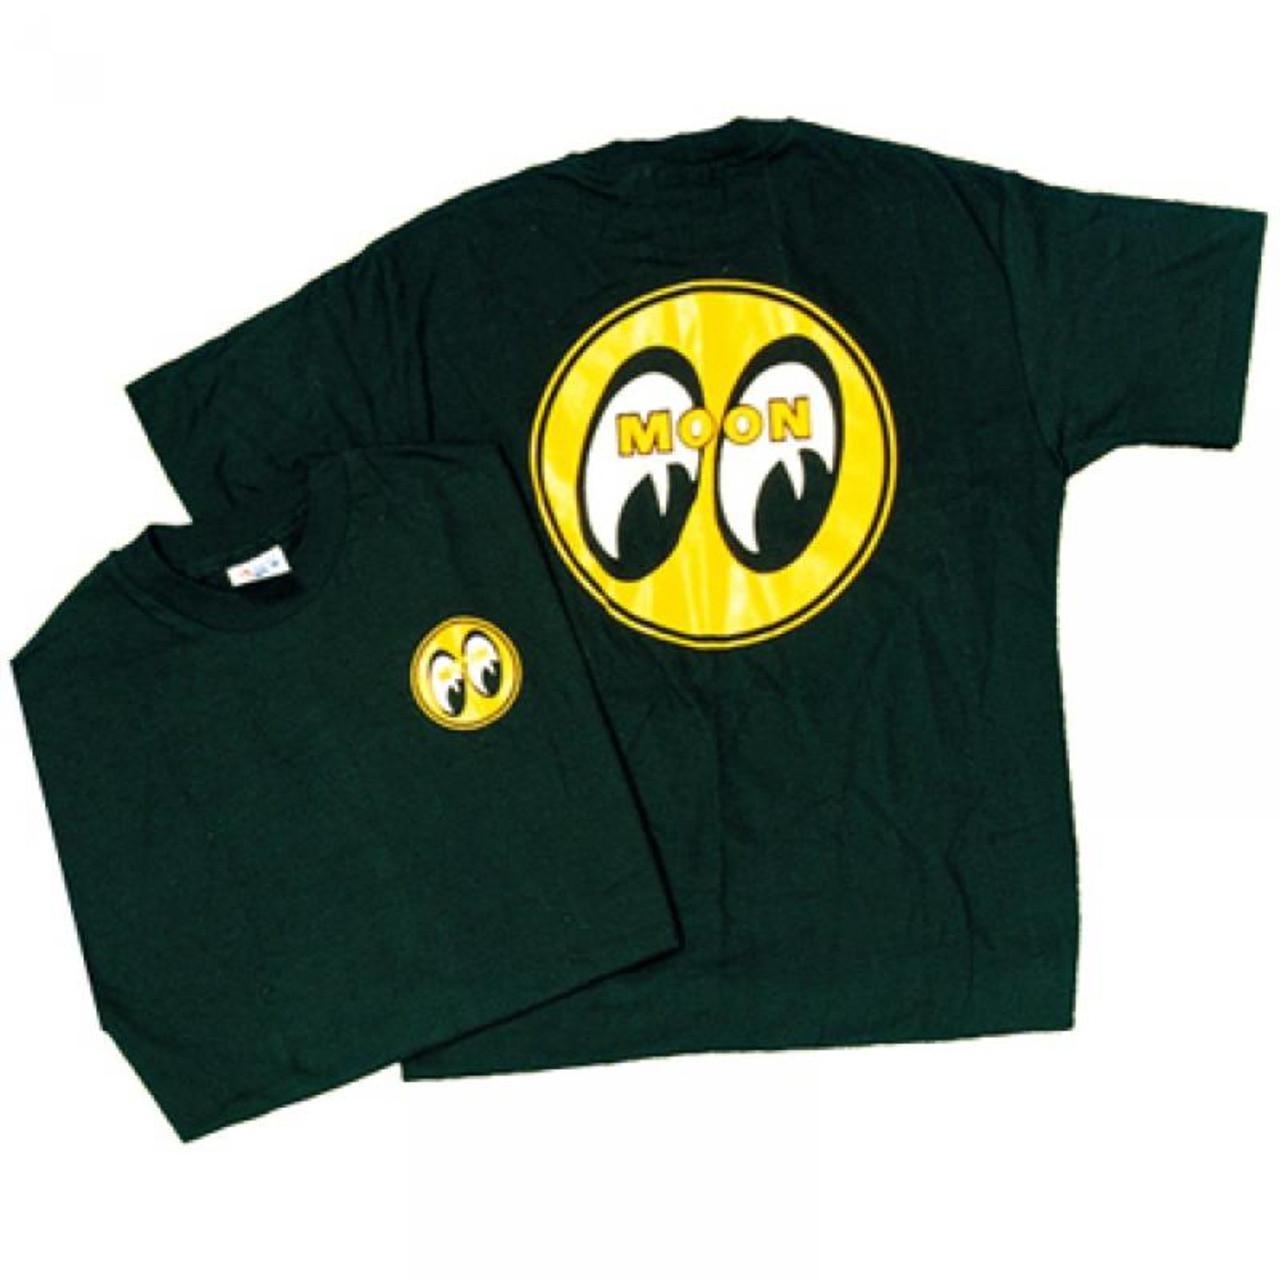 Mooneyes T-Shirt - Black - Small Logo Front/Big Logo Back